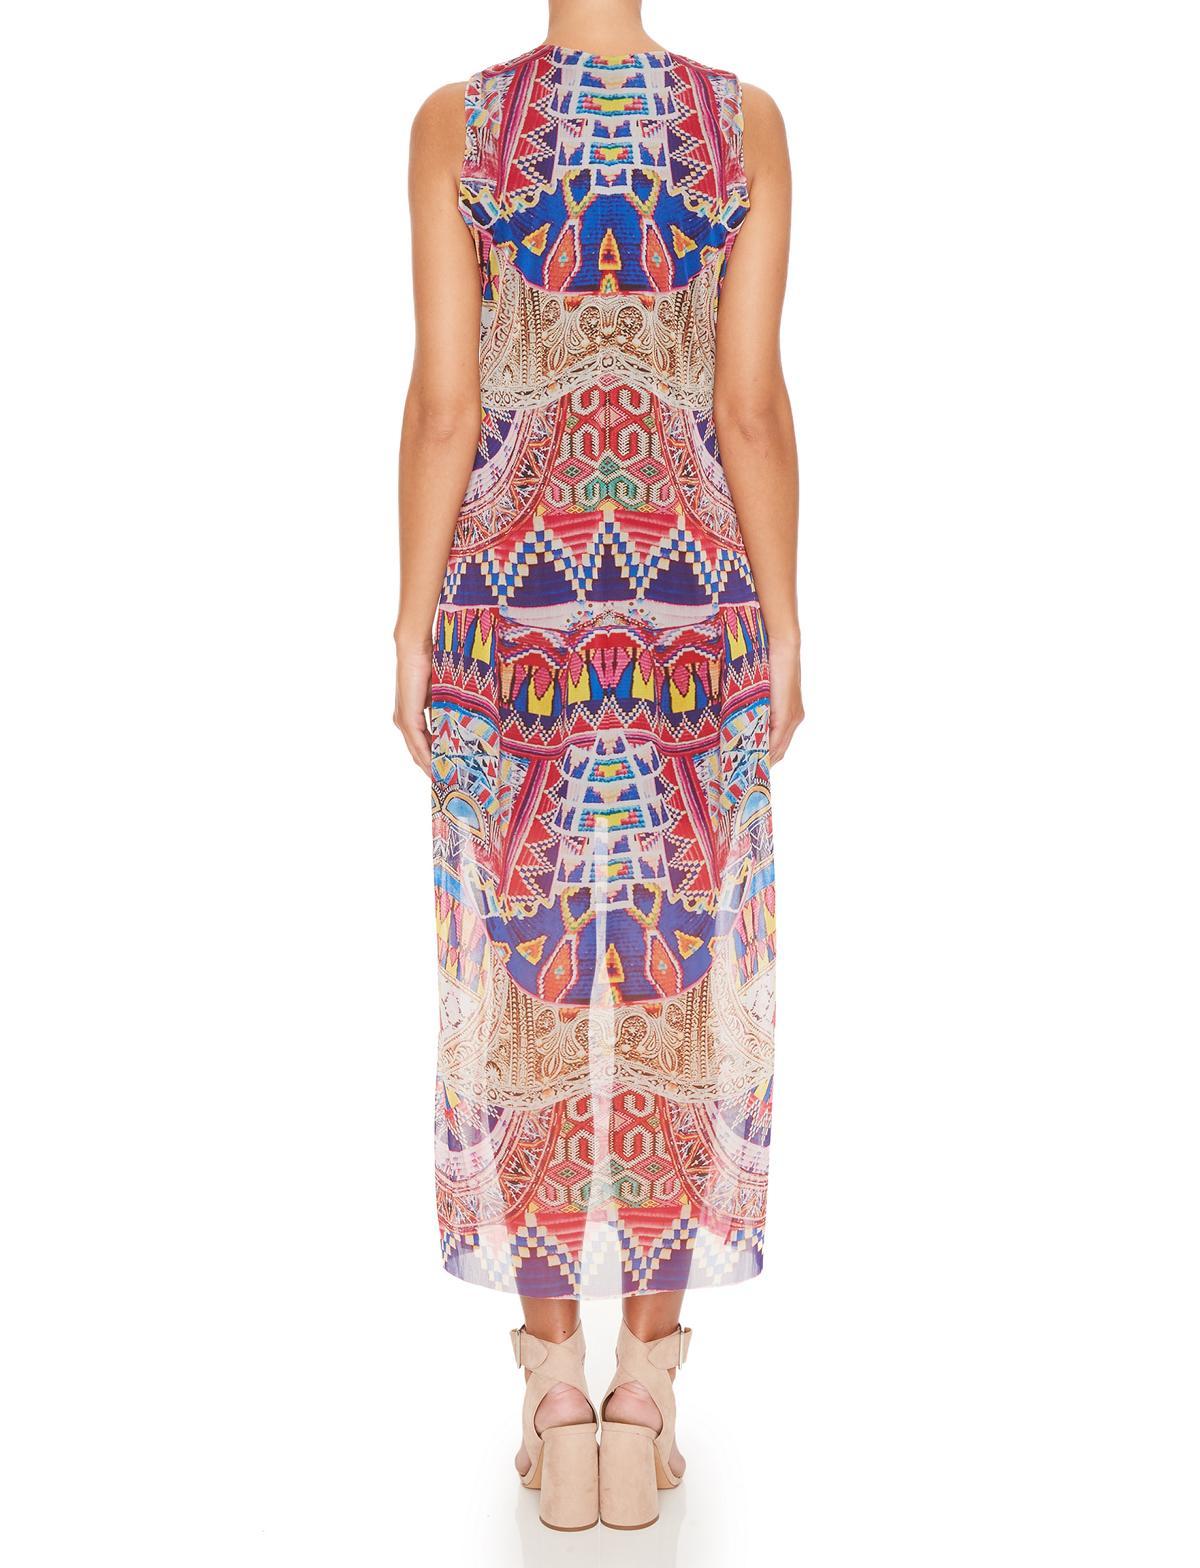 Rückansicht von Ana Alcazar Maxi Kleid Melibenas  angezogen an Model